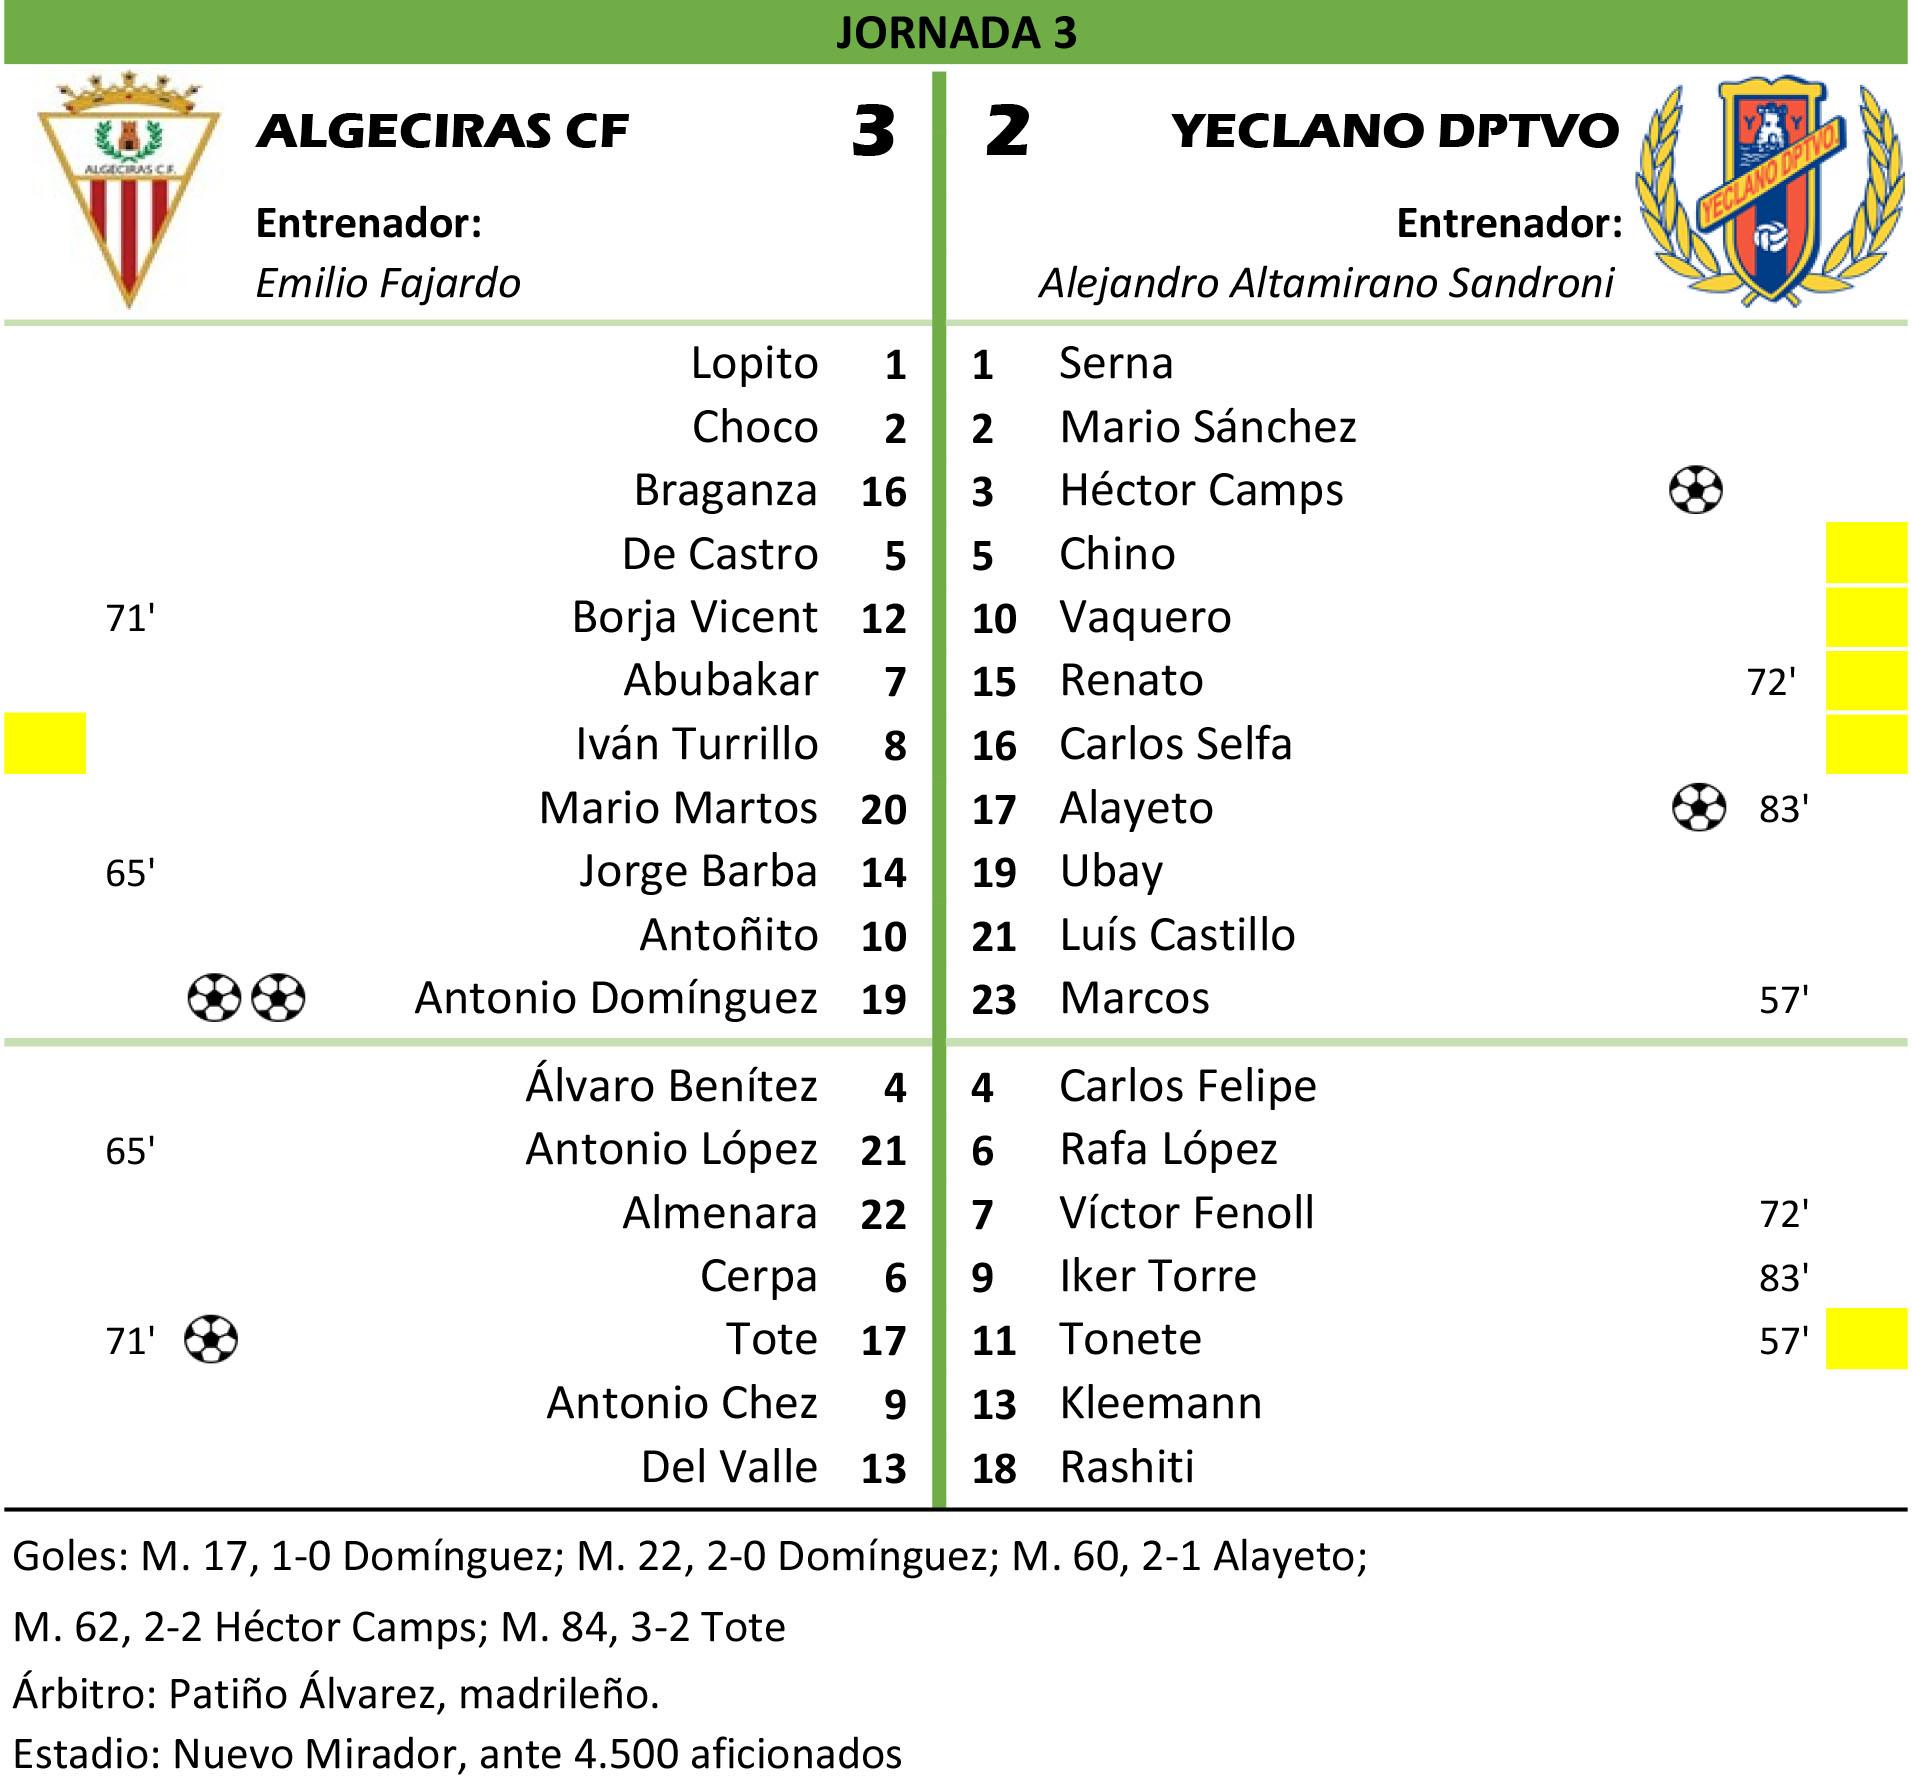 YeclaSPort_Ficha_Algeciras_Yeclano